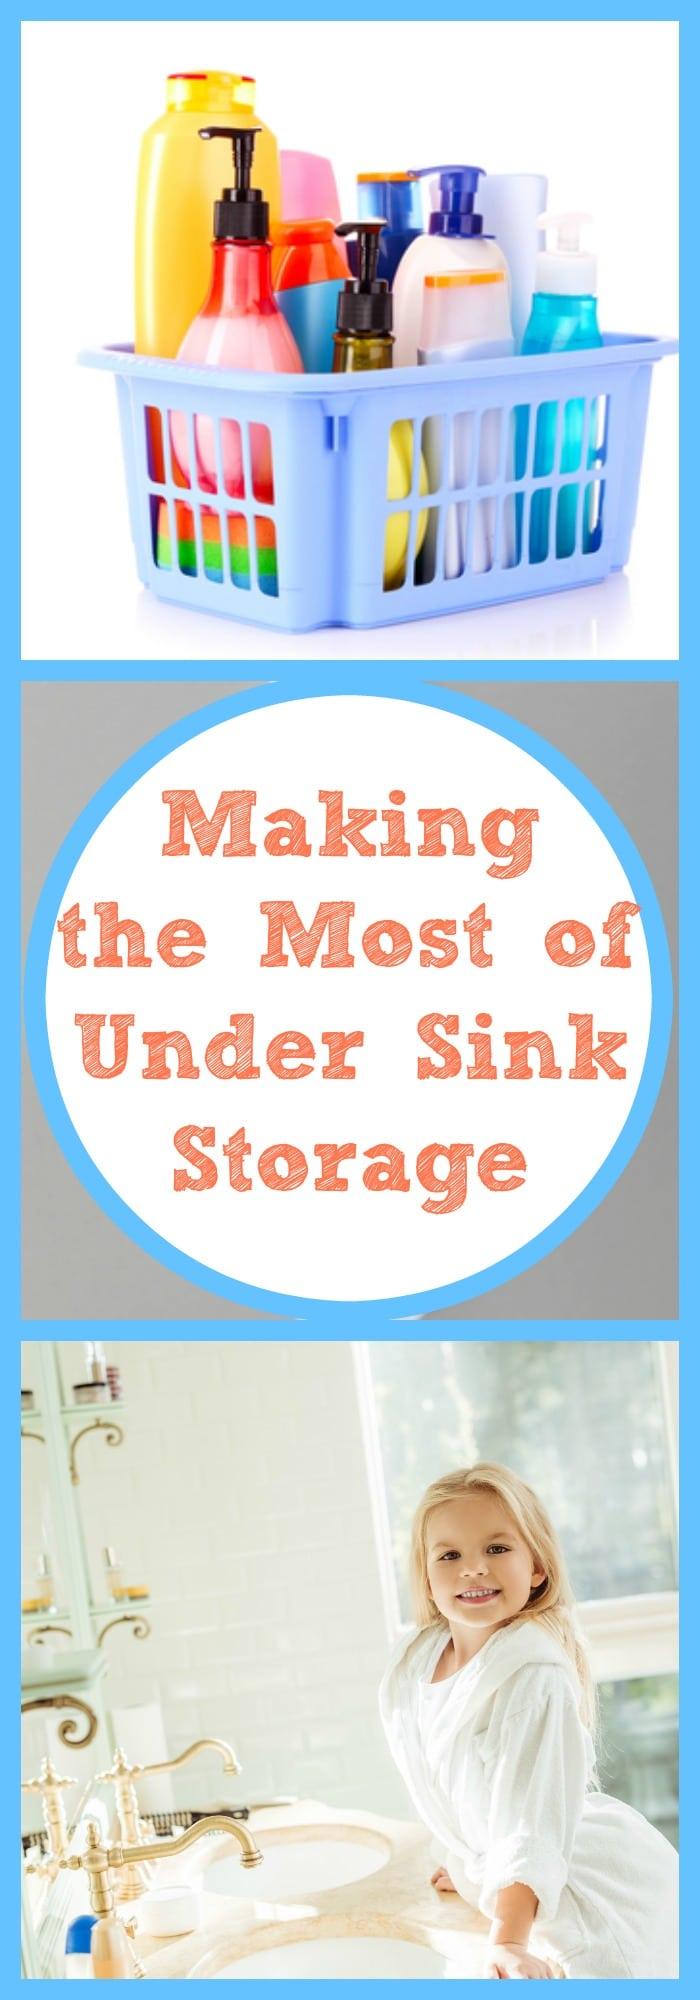 Making the Most of Under Sink Storage